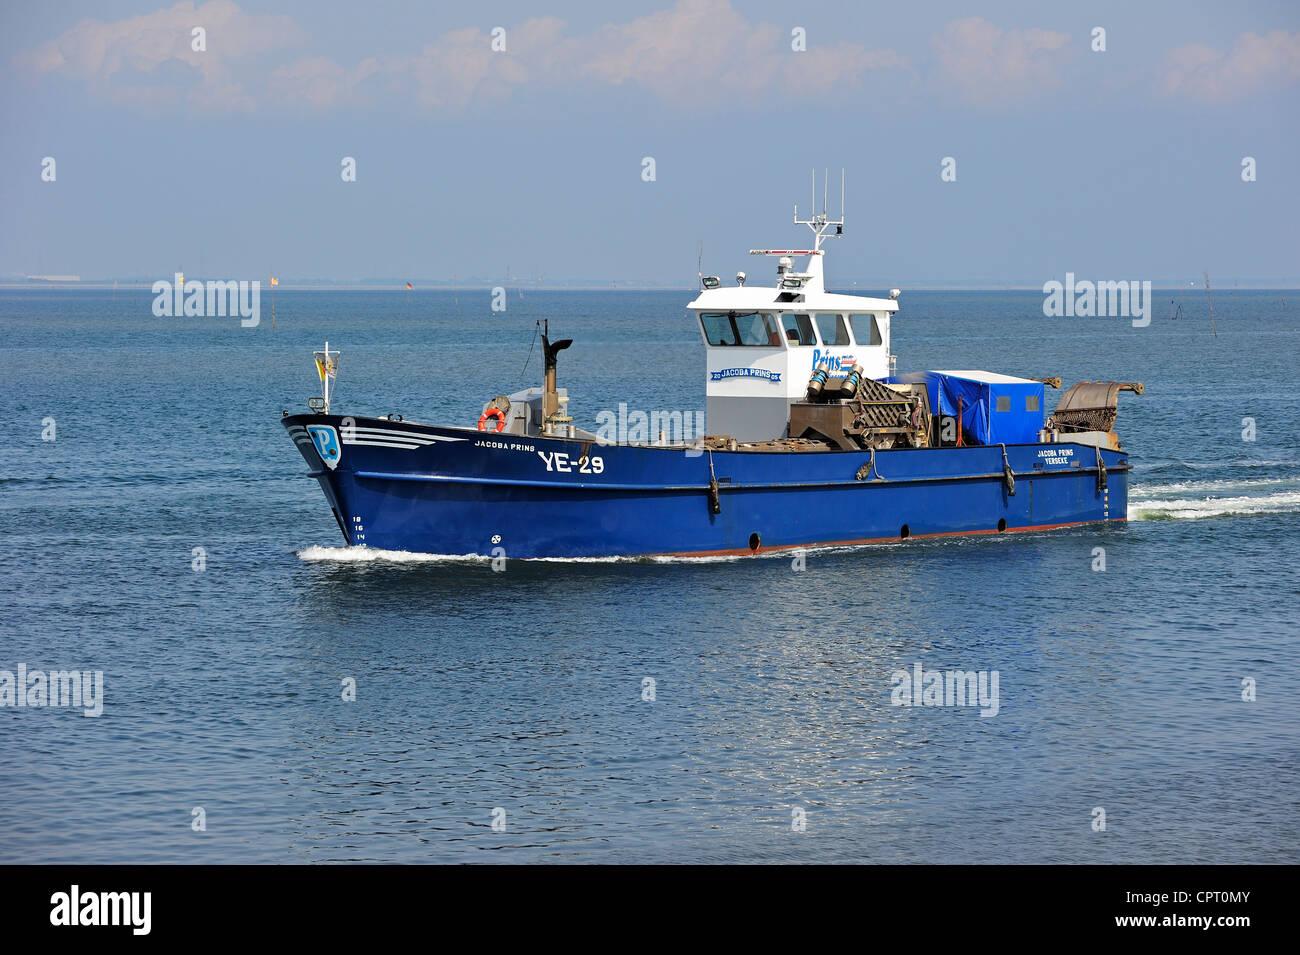 Fishing boat / Mussel cutter sailing to the port of Yerseke along the Oosterschelde / Eastern Scheldt, Zealand, - Stock Image